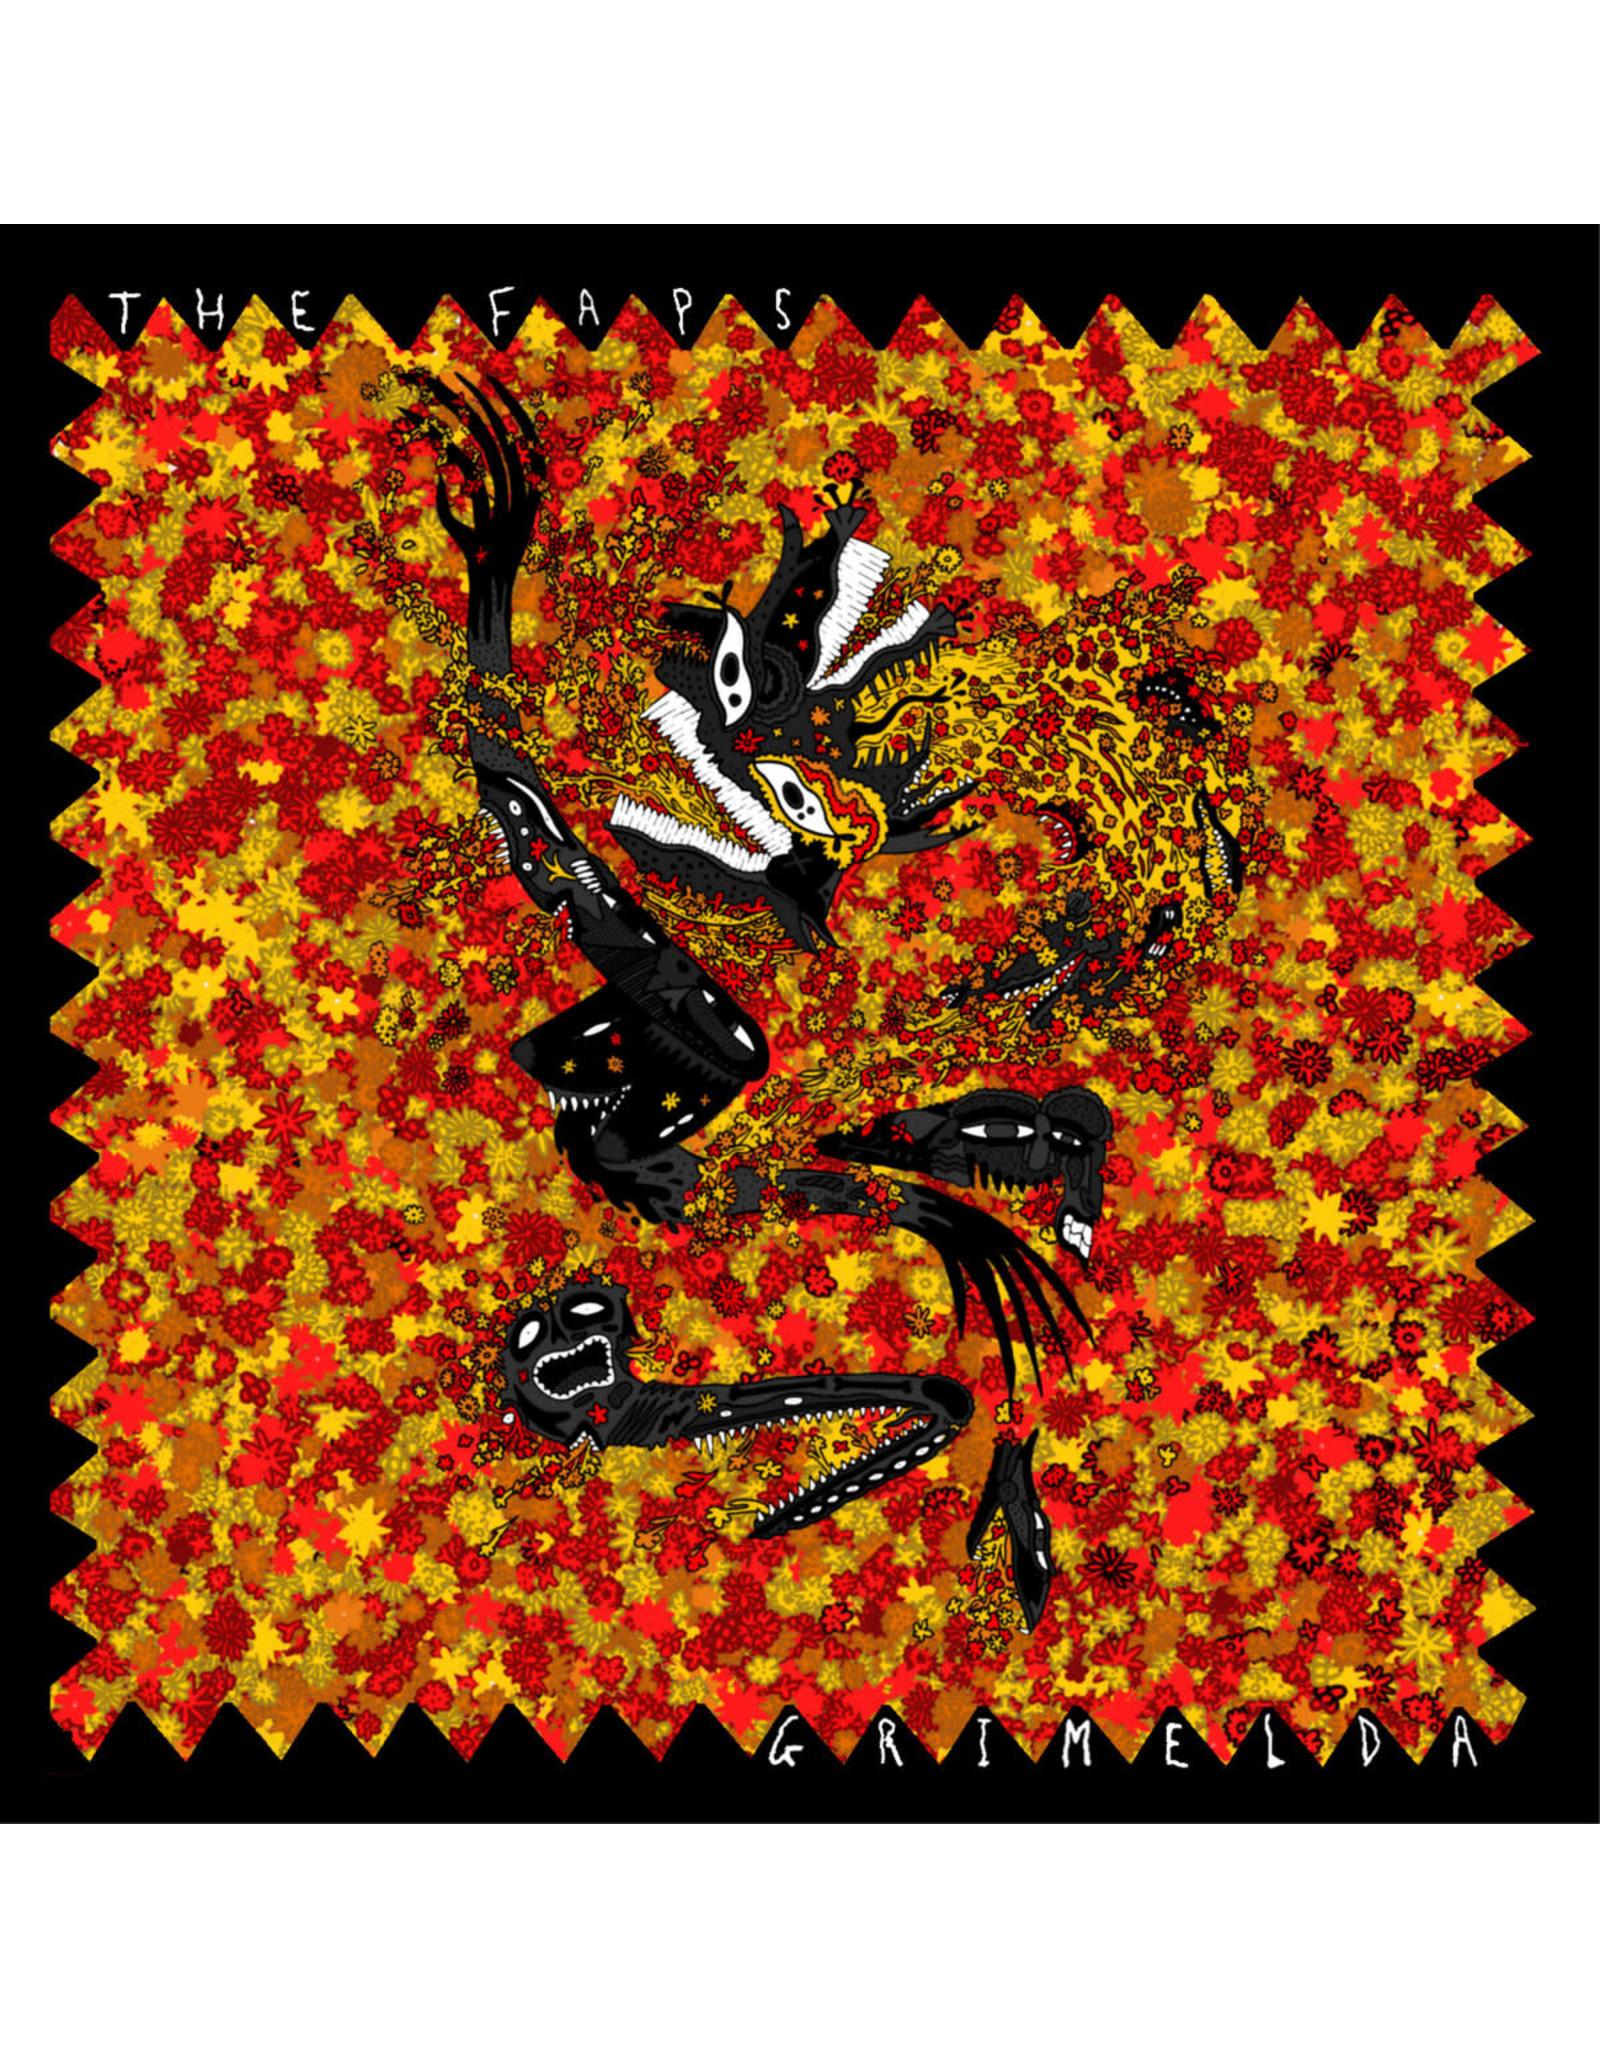 Faps, The - Grimelda CD